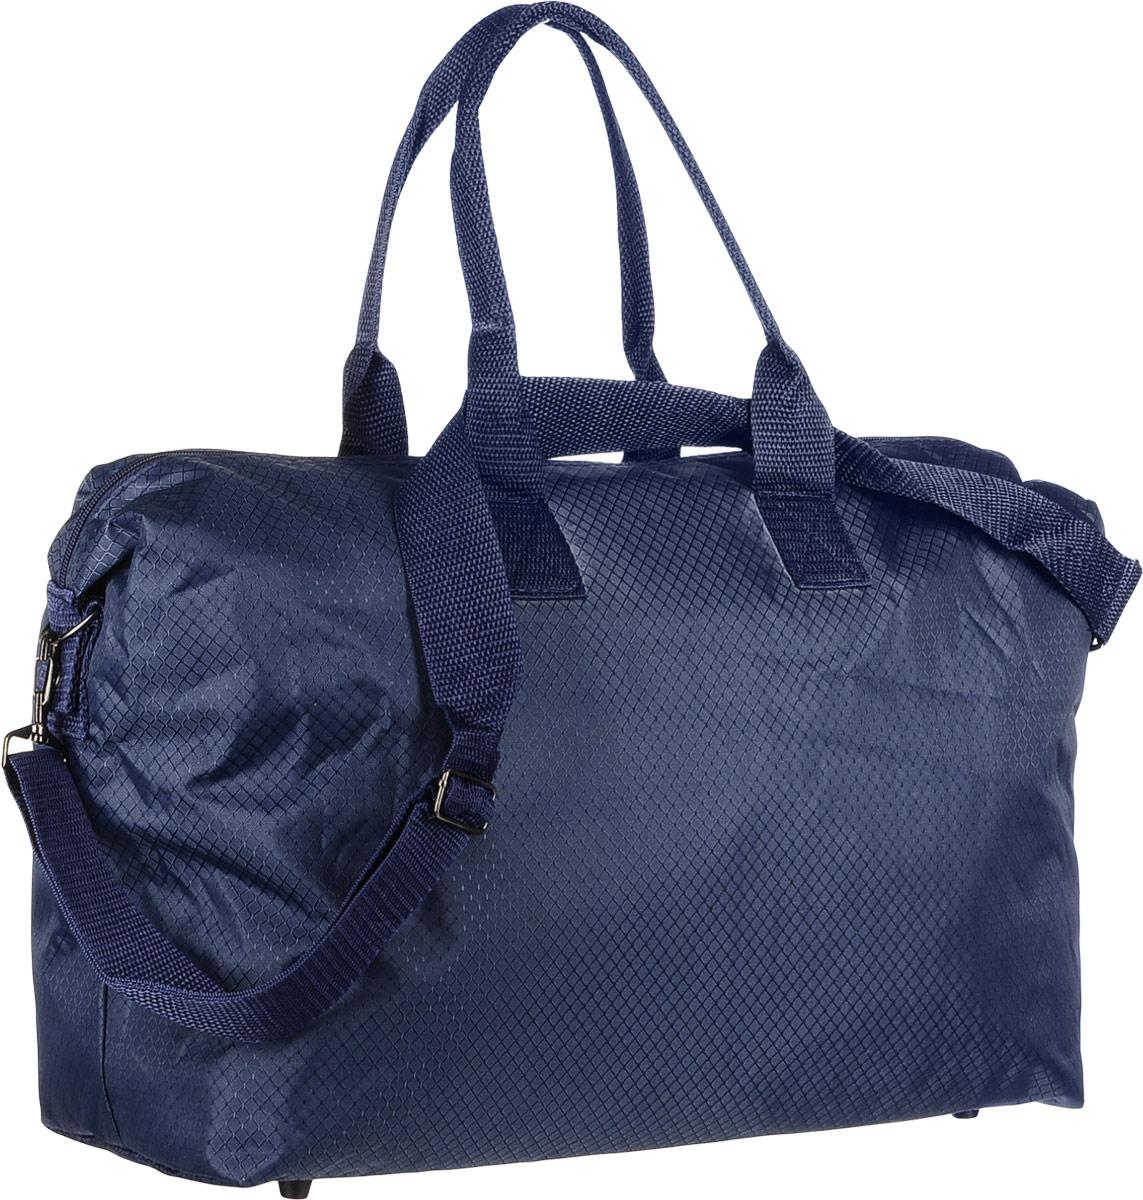 Сумка дорожная  Sarabella , цвет: синий, 43 х 18 х 32 см. 1388688 - Дорожные сумки